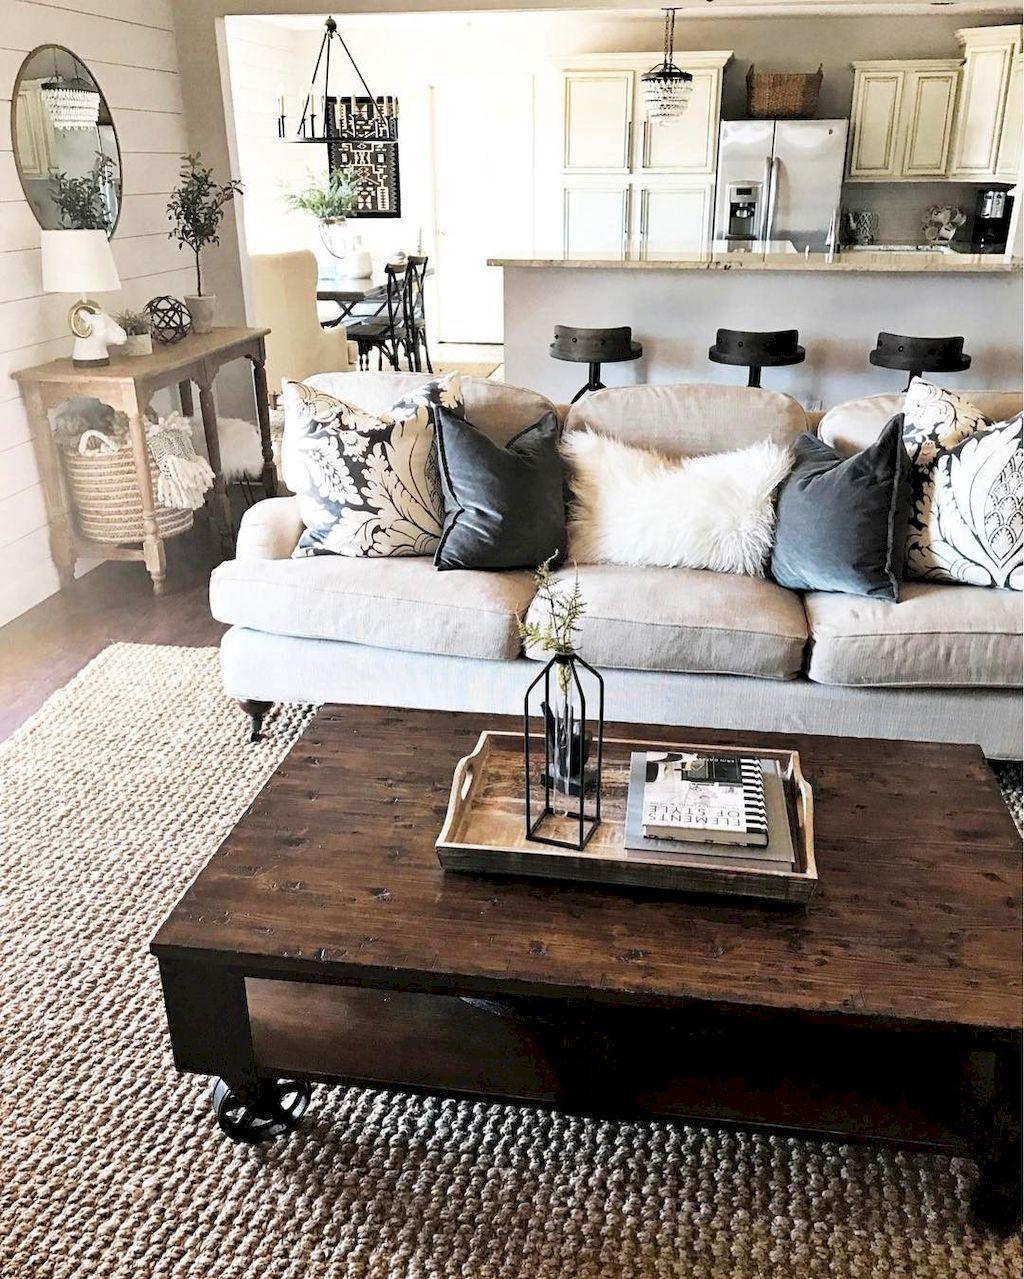 53 cozy modern farmhouse living room decor ideas modern on modern farmhouse living room design and decor inspirations country farmhouse furniture id=58778